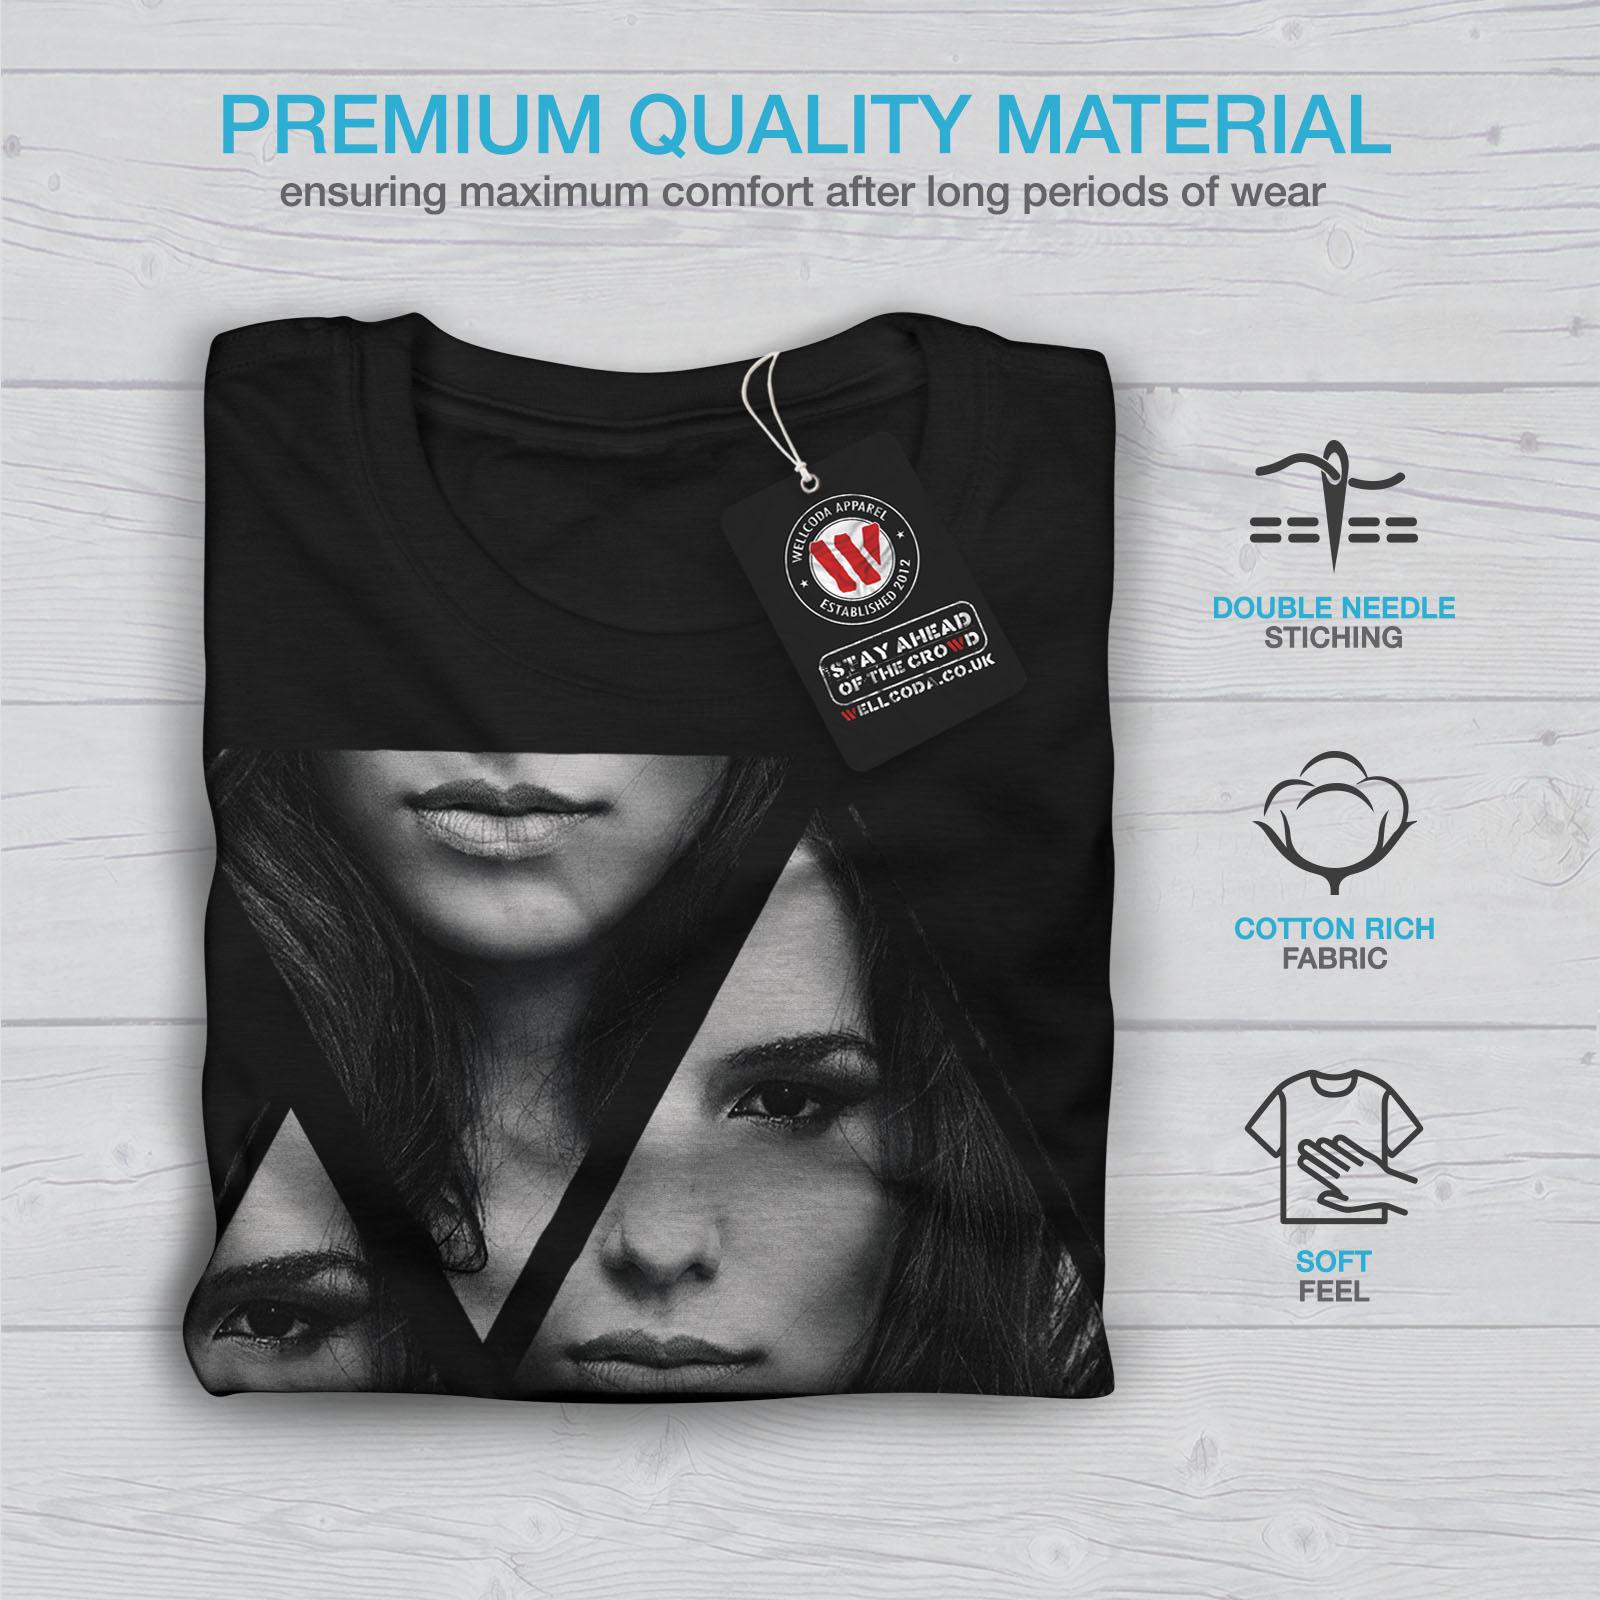 Wellcoda-Art-Fashion-Face-T-shirt-homme-Abstract-Design-graphique-imprime-Tee miniature 7